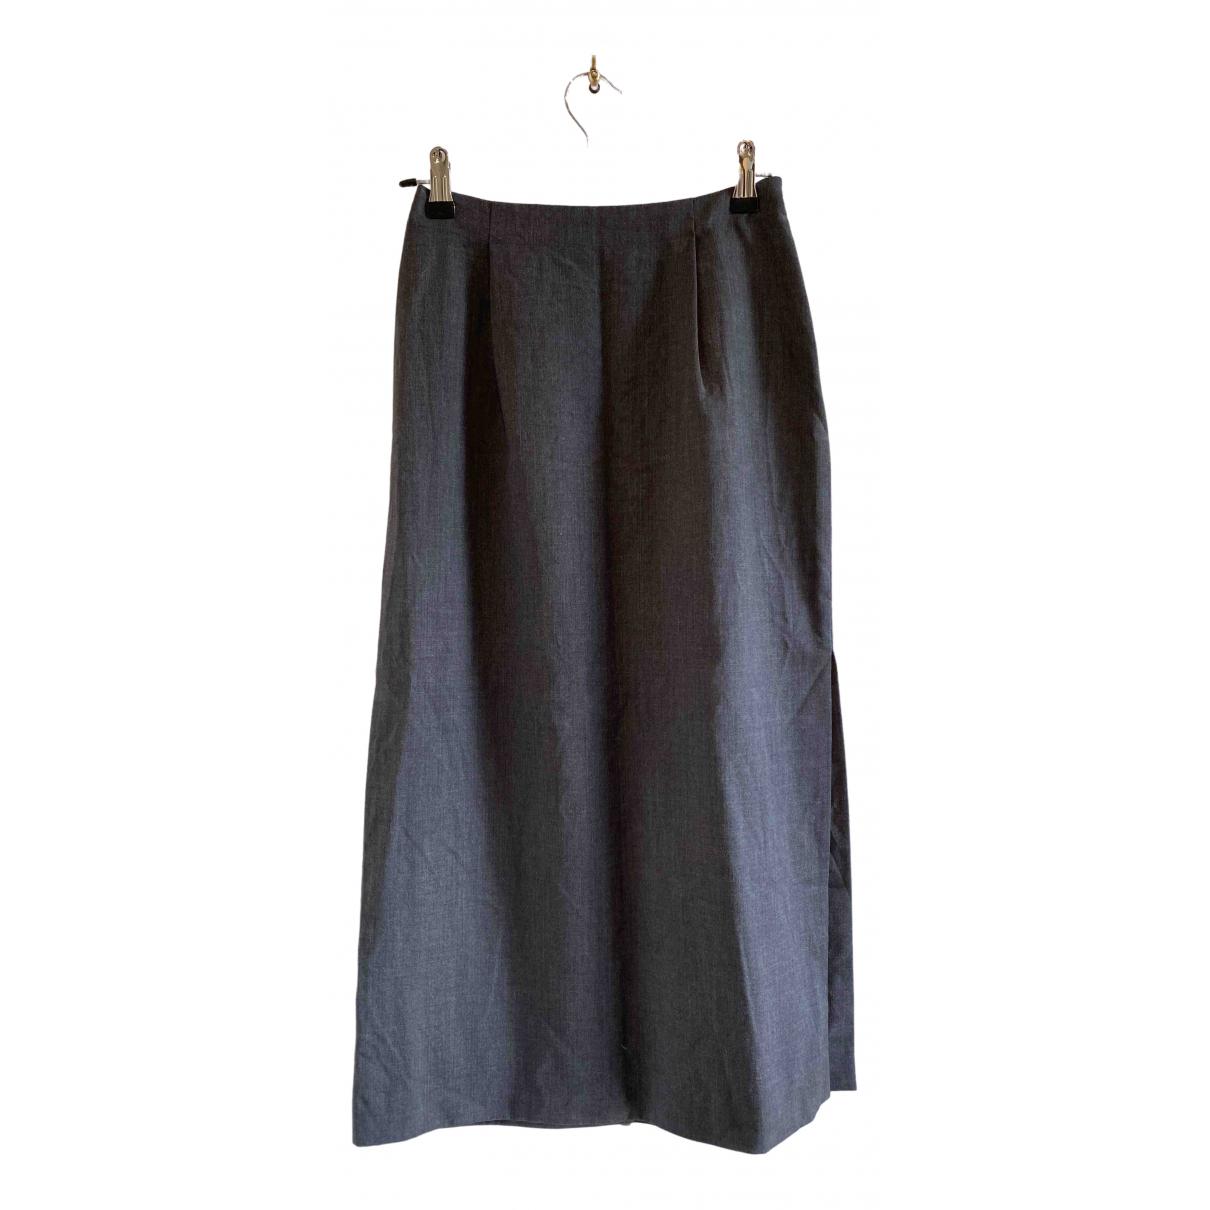 Max Mara \N Grey Wool skirt for Women 38 IT